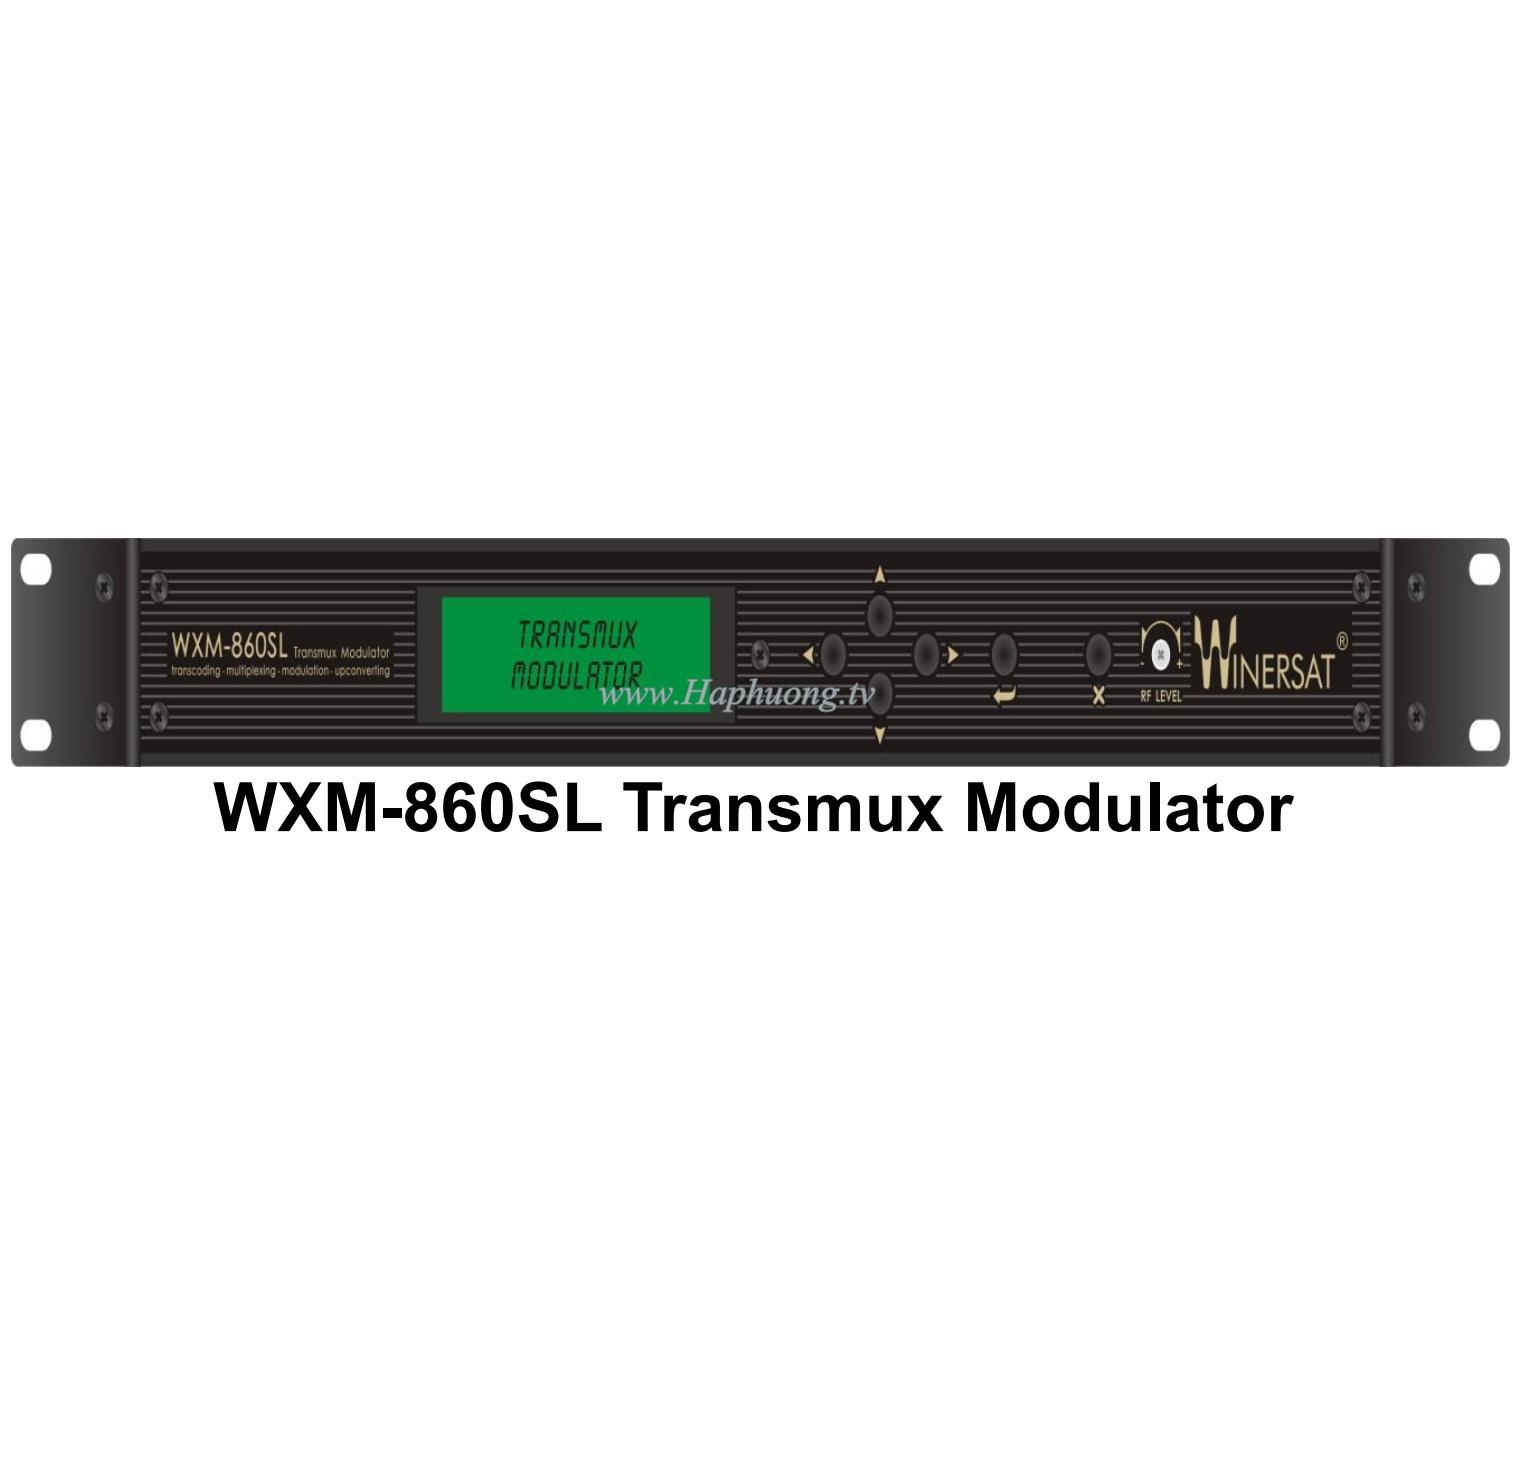 Transmux Modulator Winersat WXM 860SL